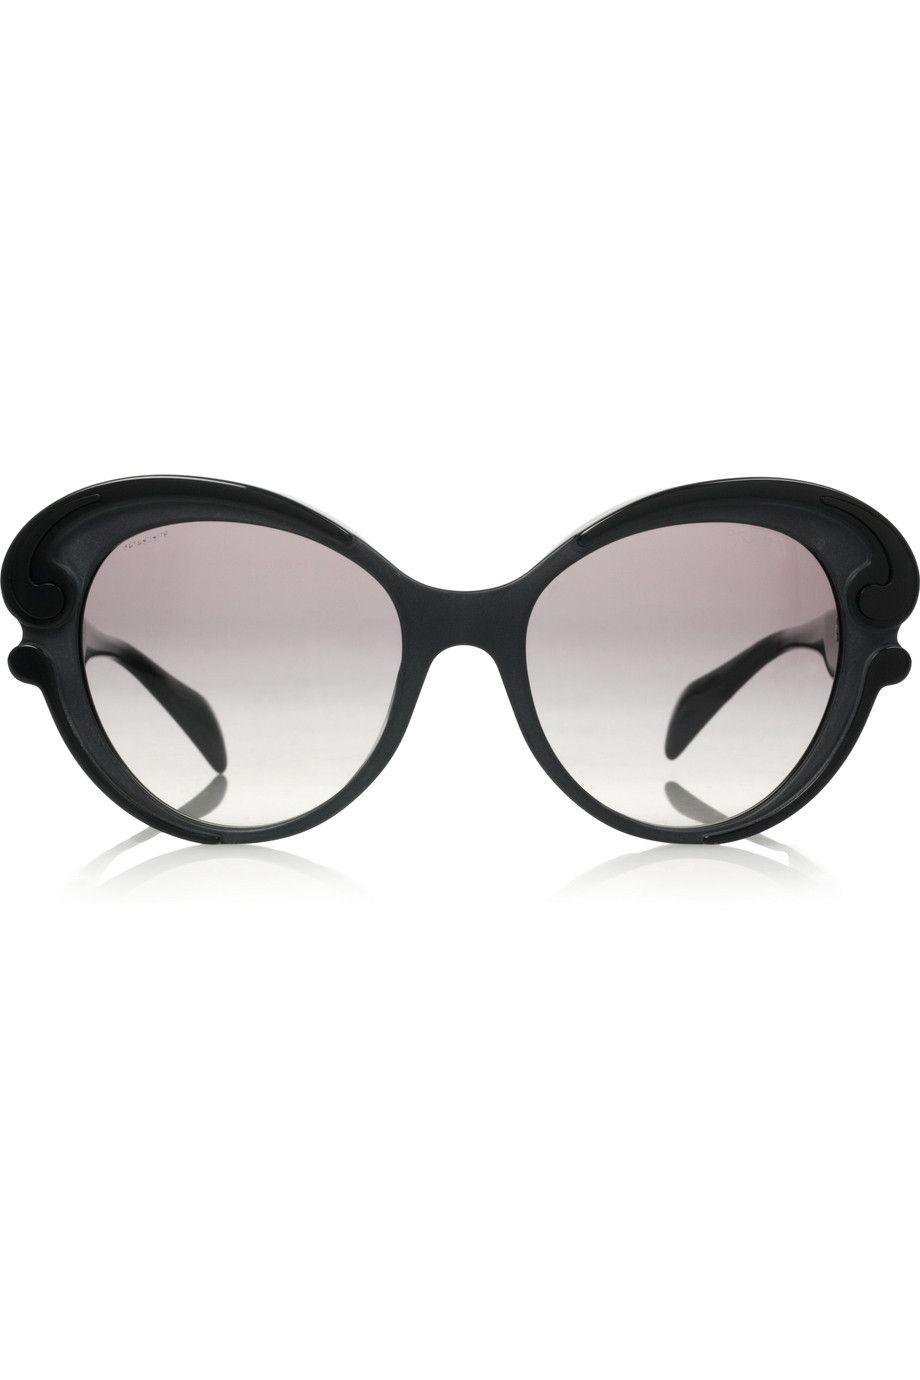 f15cbc6c444 Prada - Butterfly-Frame Acetate Sunglasses